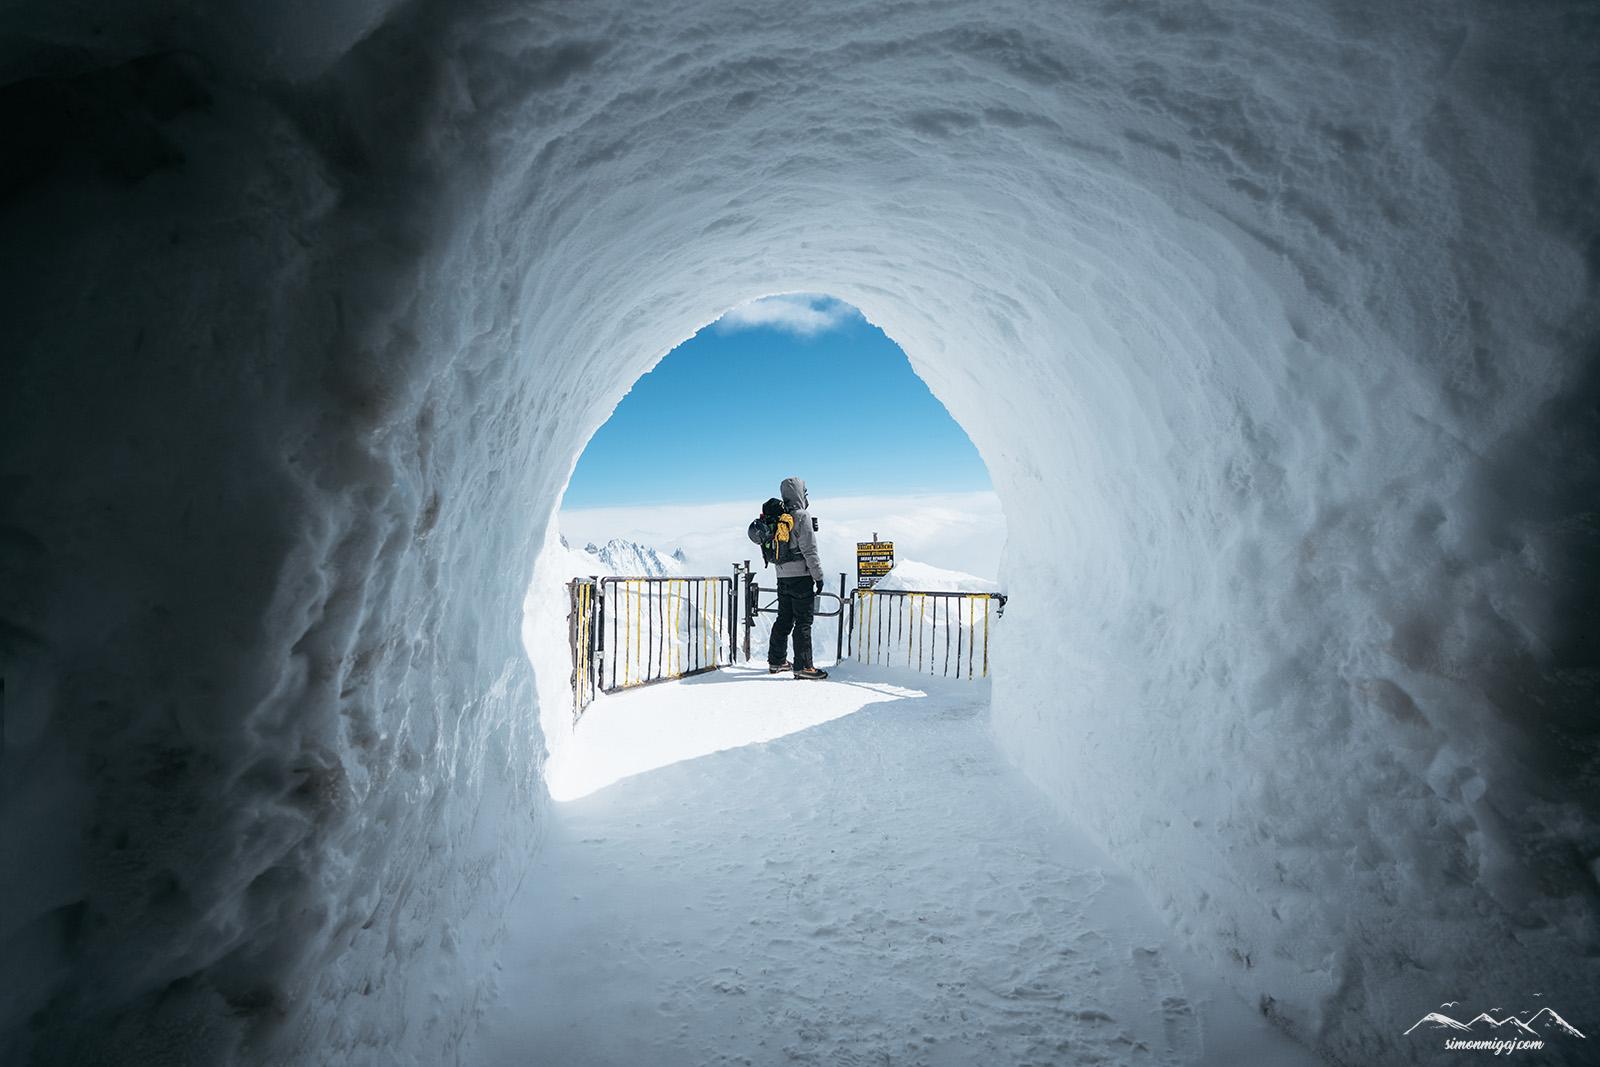 back-ice-caves-aiguille-du-midi-chamonix-france-alps.jpg